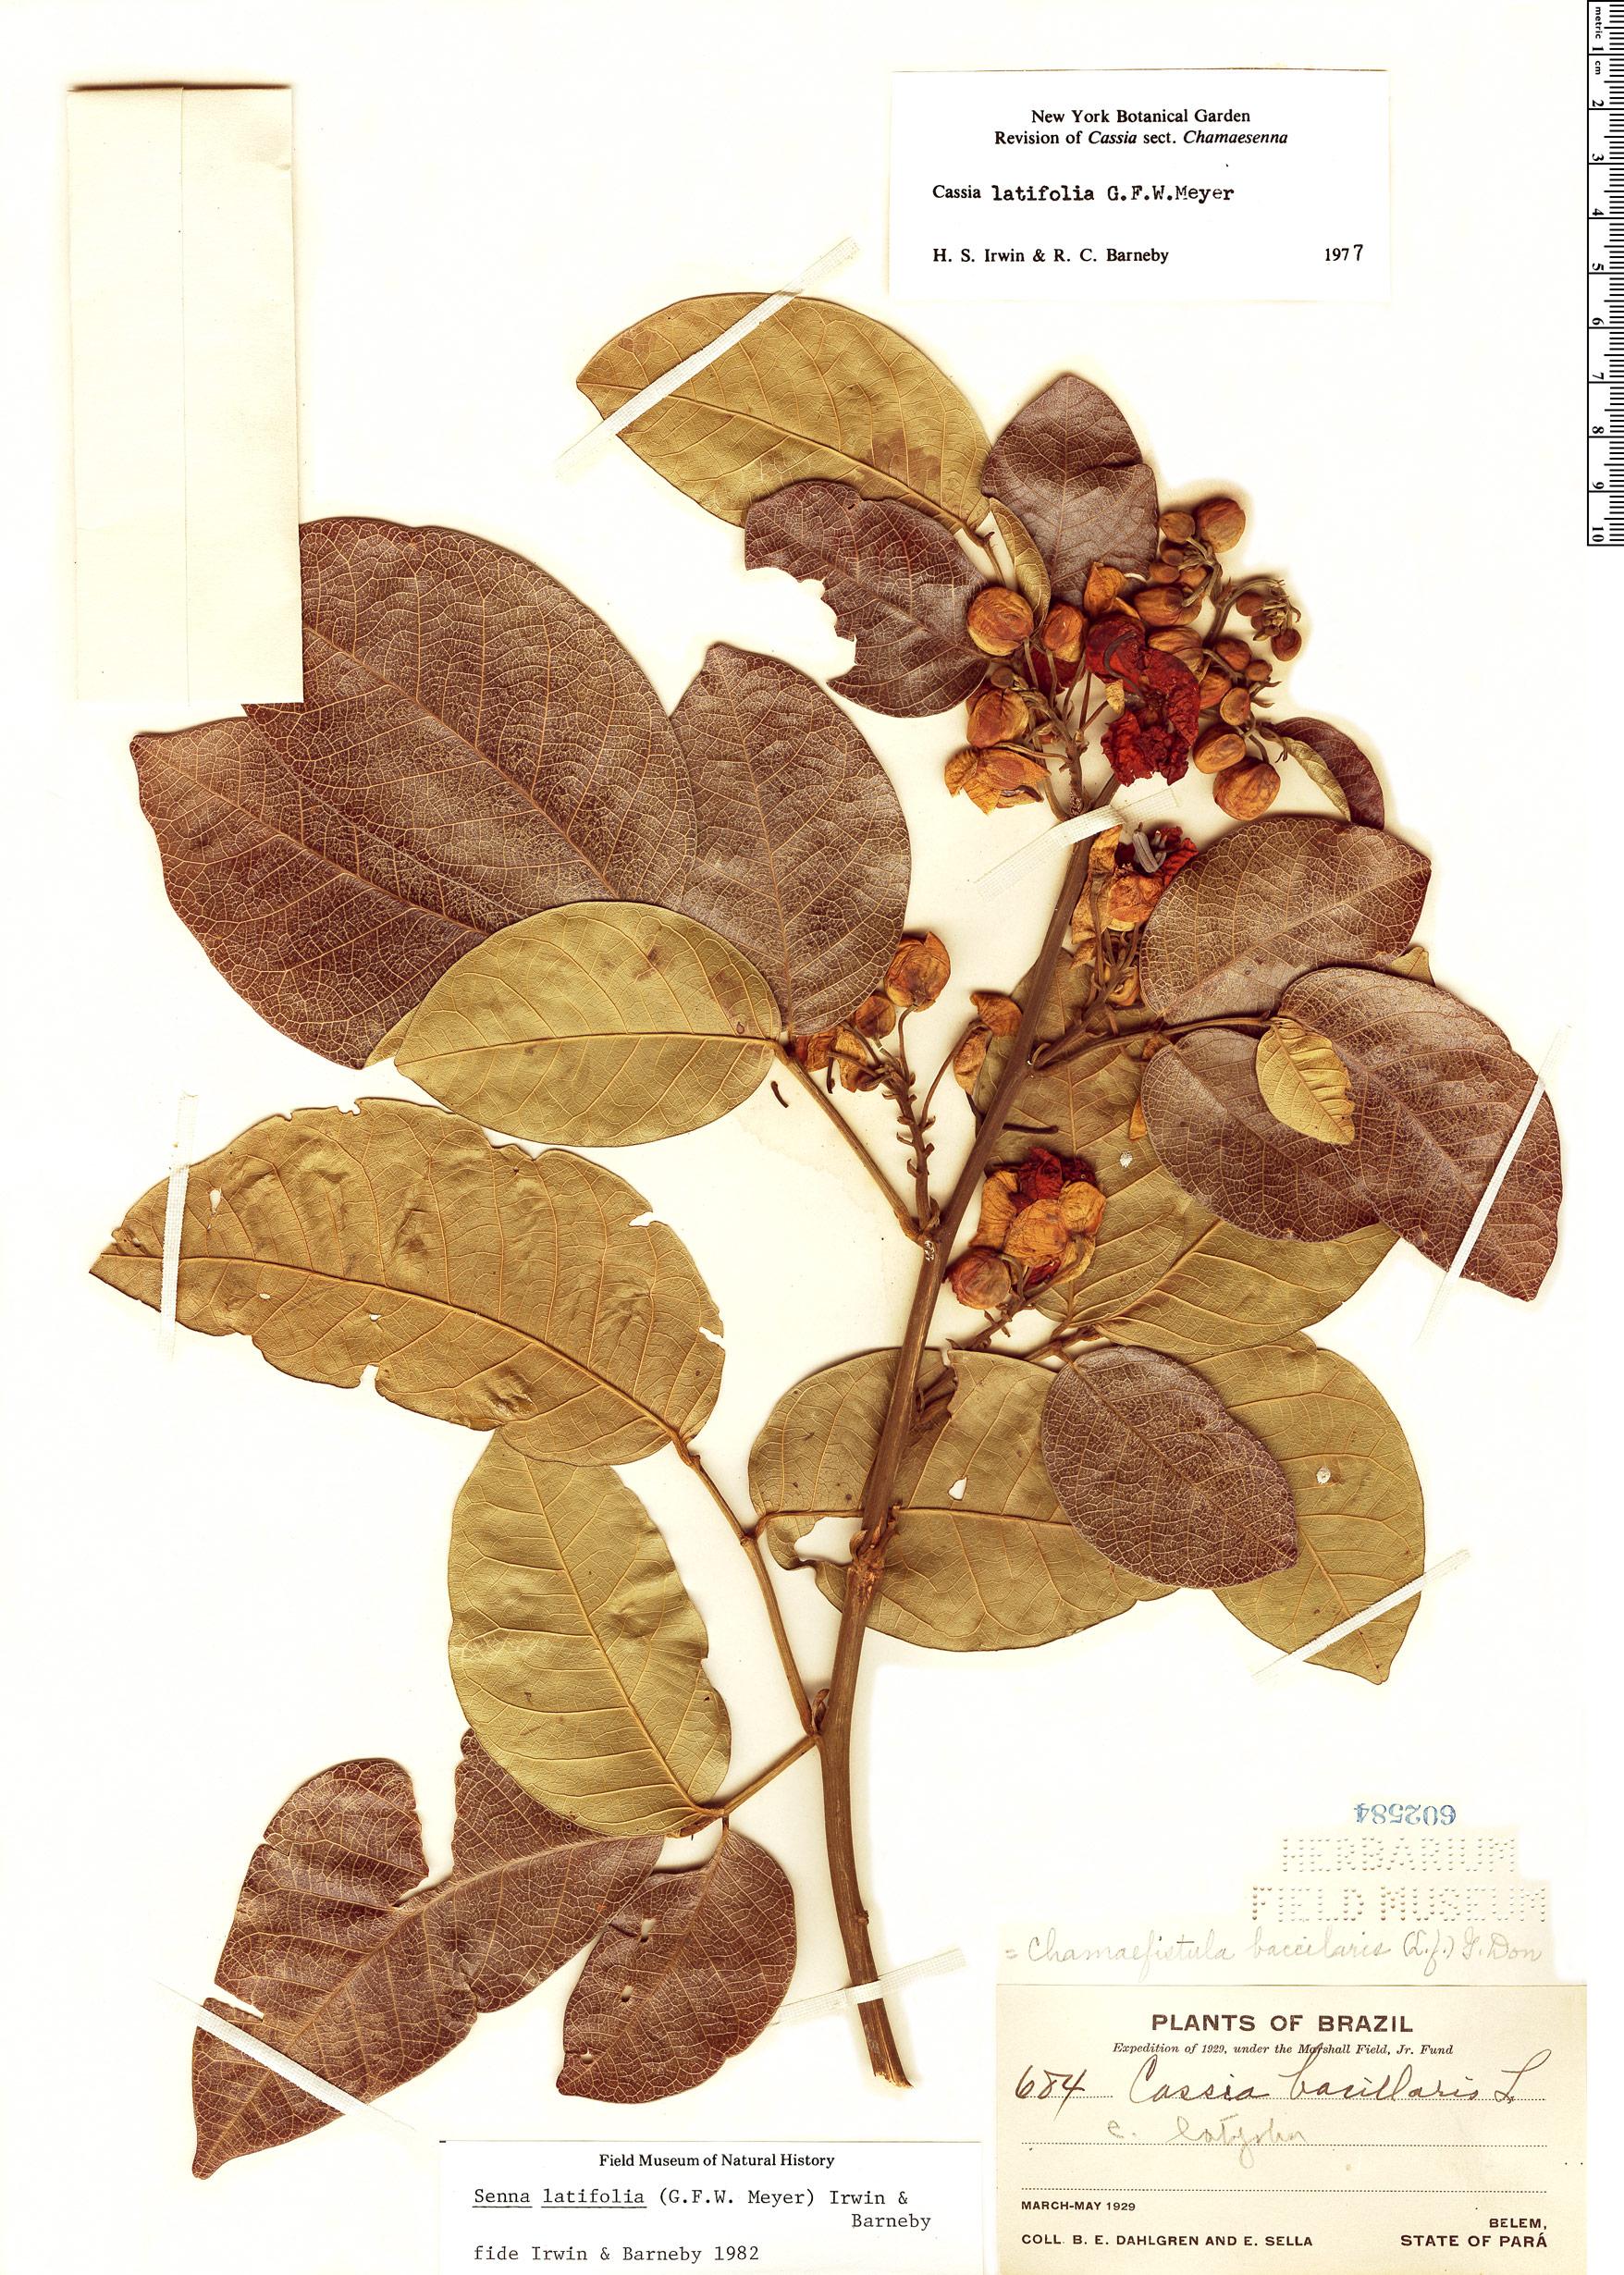 Specimen: Senna latifolia